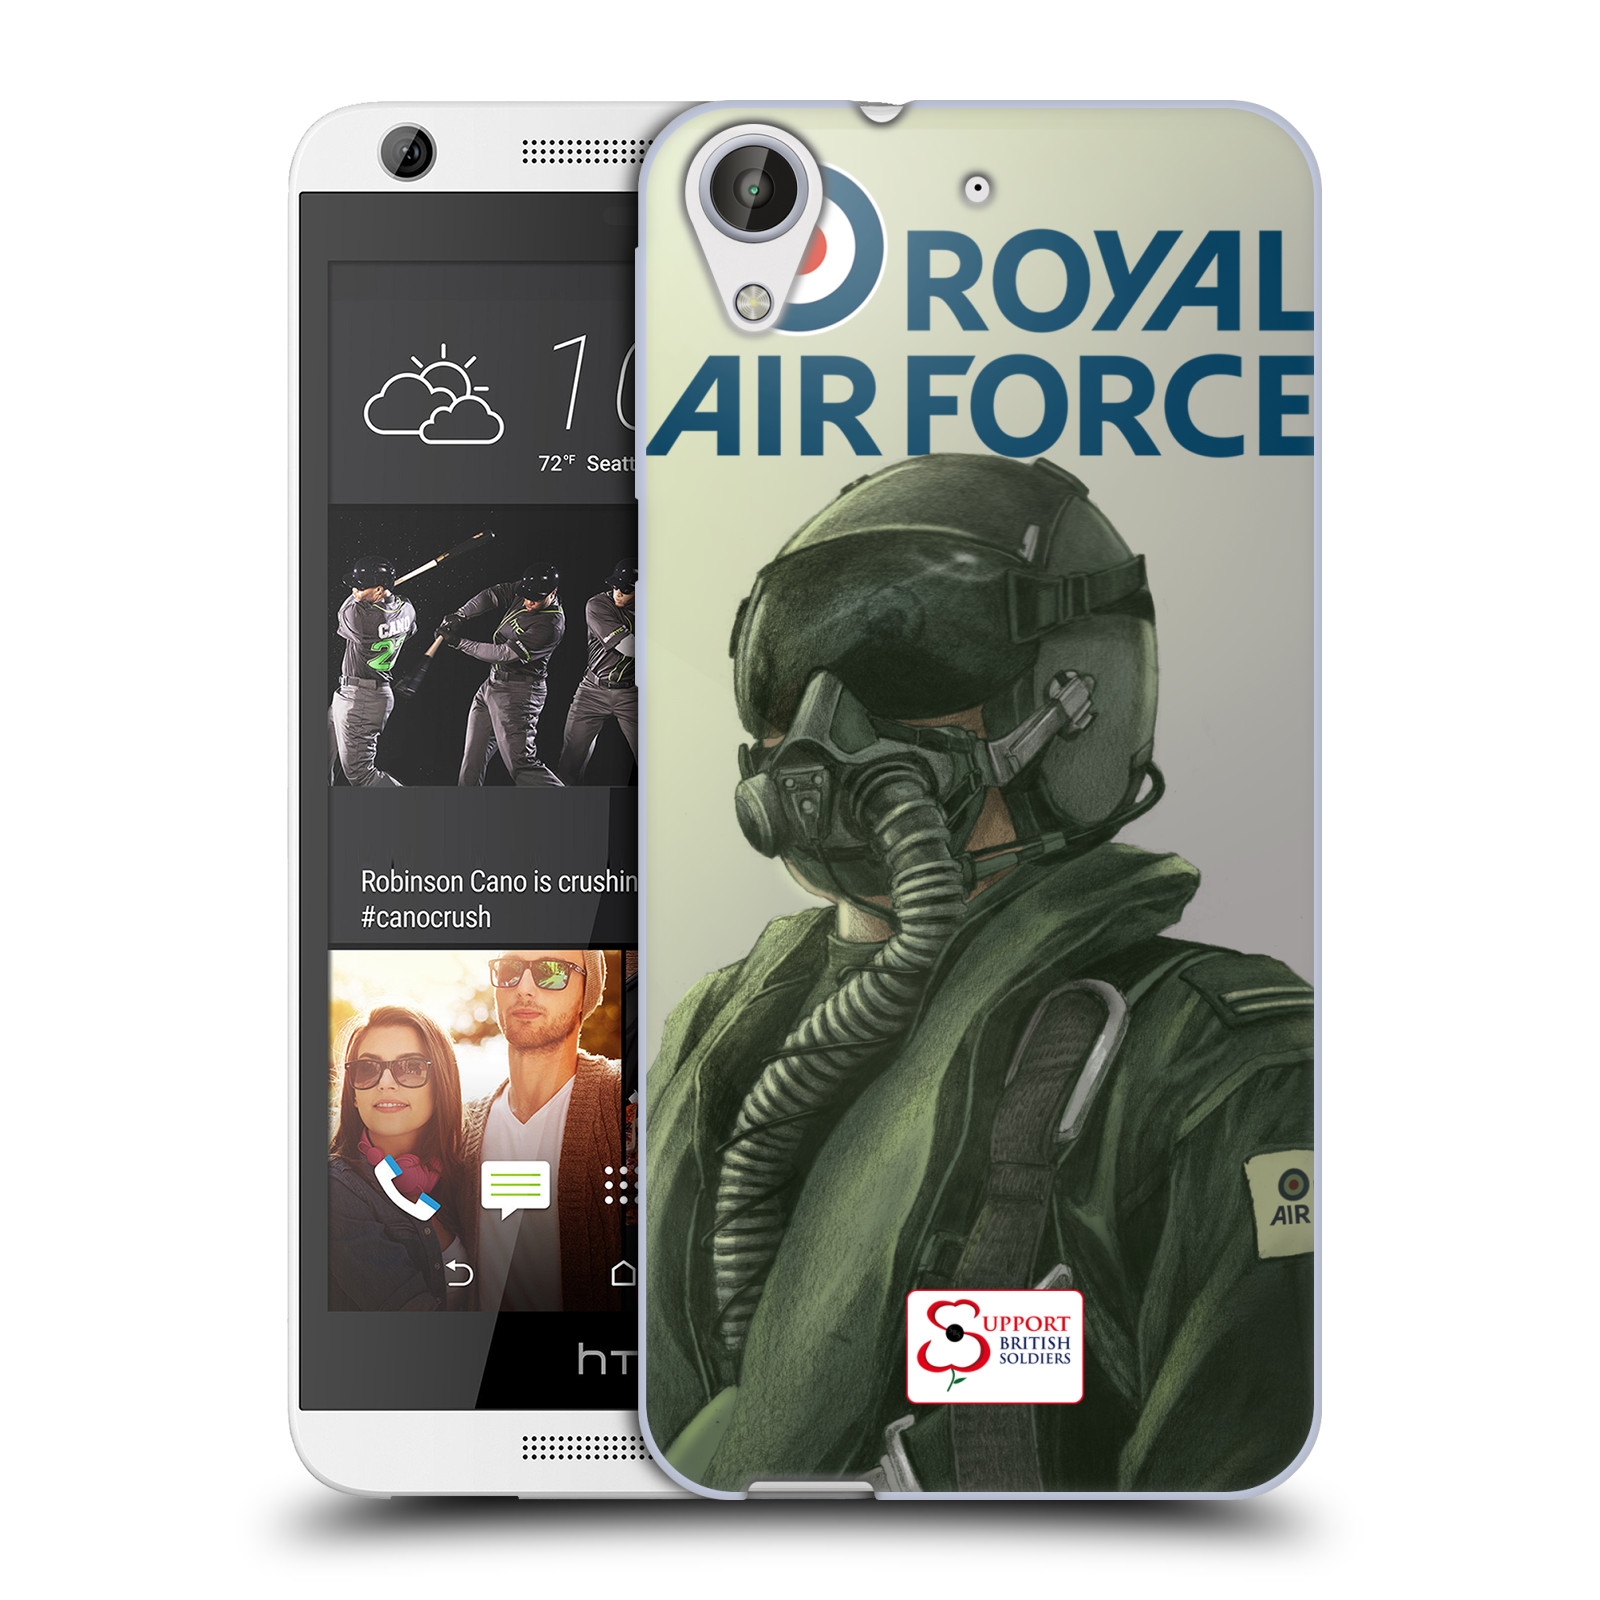 Silikonové pouzdro na mobil HTC Desire 626 / 626G HEAD CASE Royal Air Force (Silikonový kryt či obal na mobilní telefon HTC Desire 626 a 626G Dual SIM)